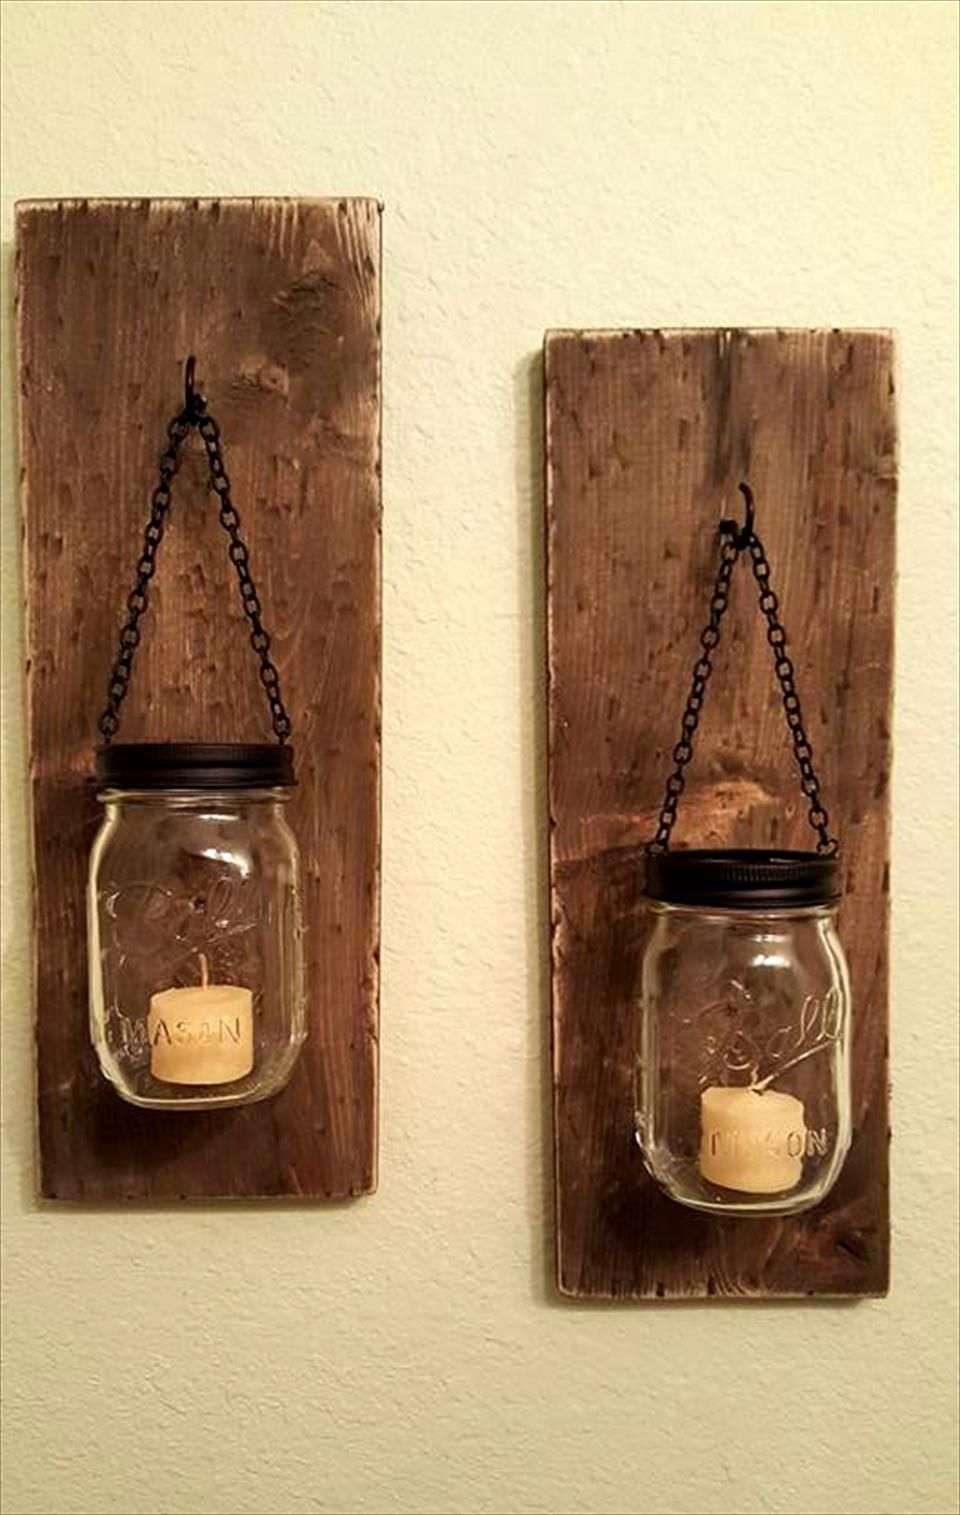 Diy Pallets And Mason Jars Candle Holder 10 Rustic Pallet